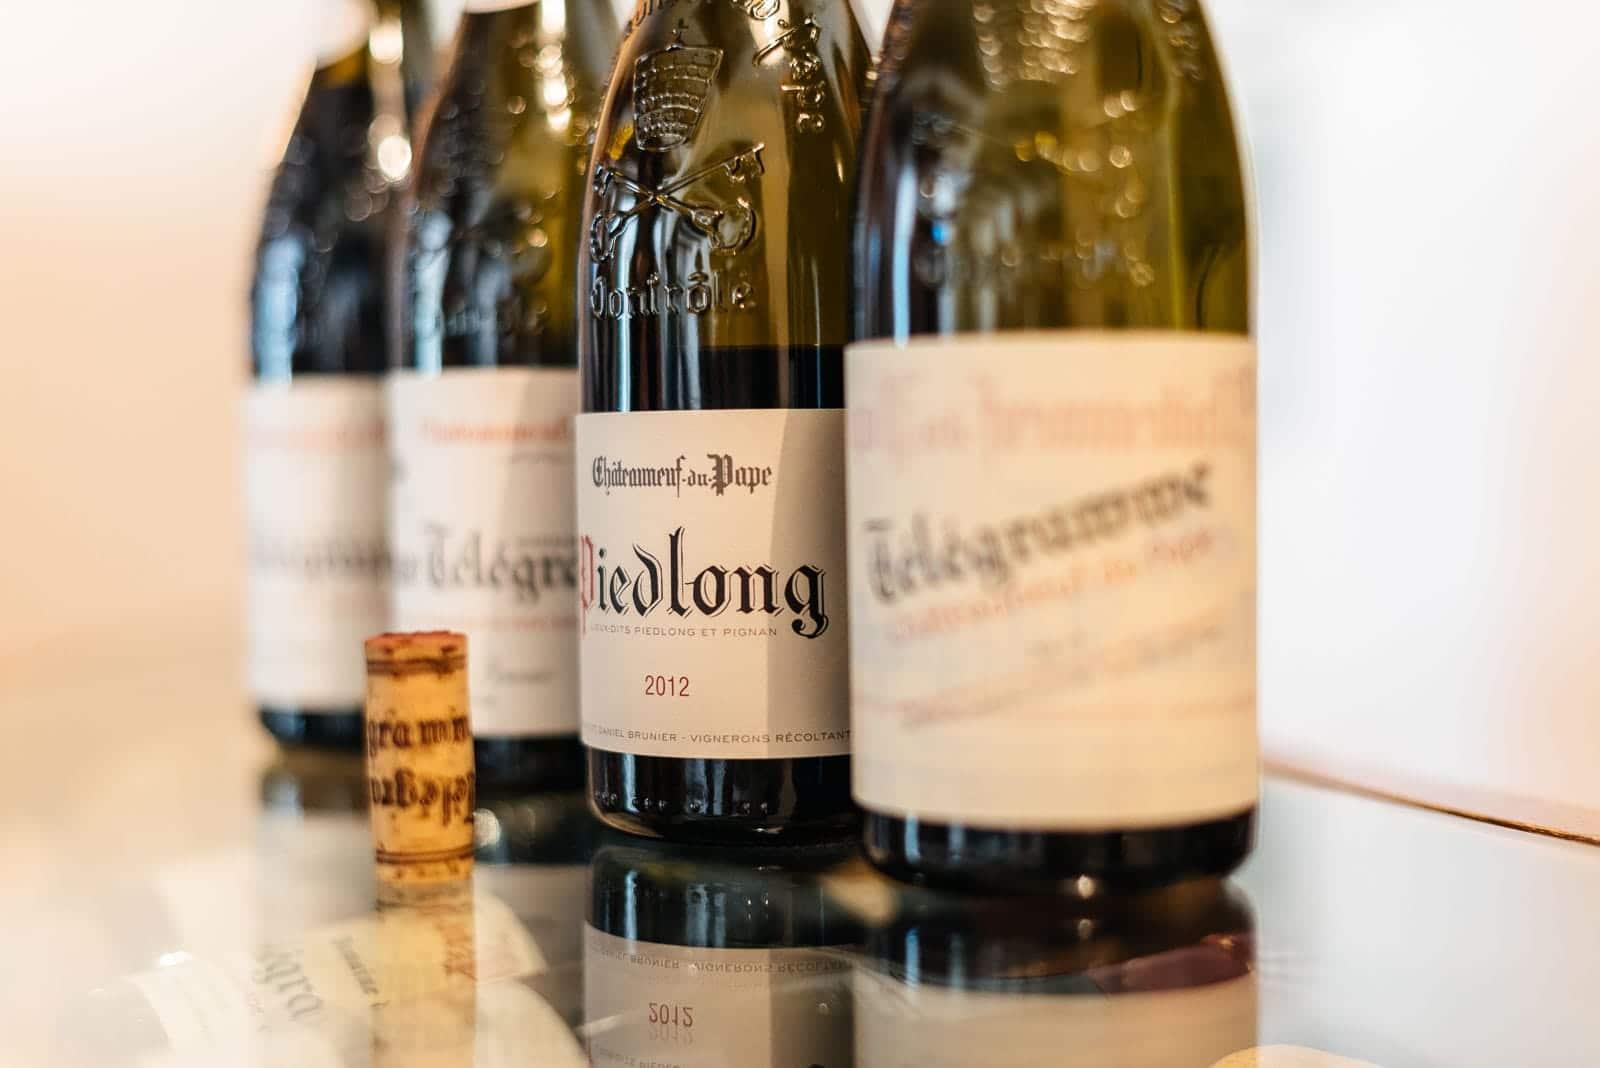 Châteauneuf du Pape wine tour, tasting four different wines